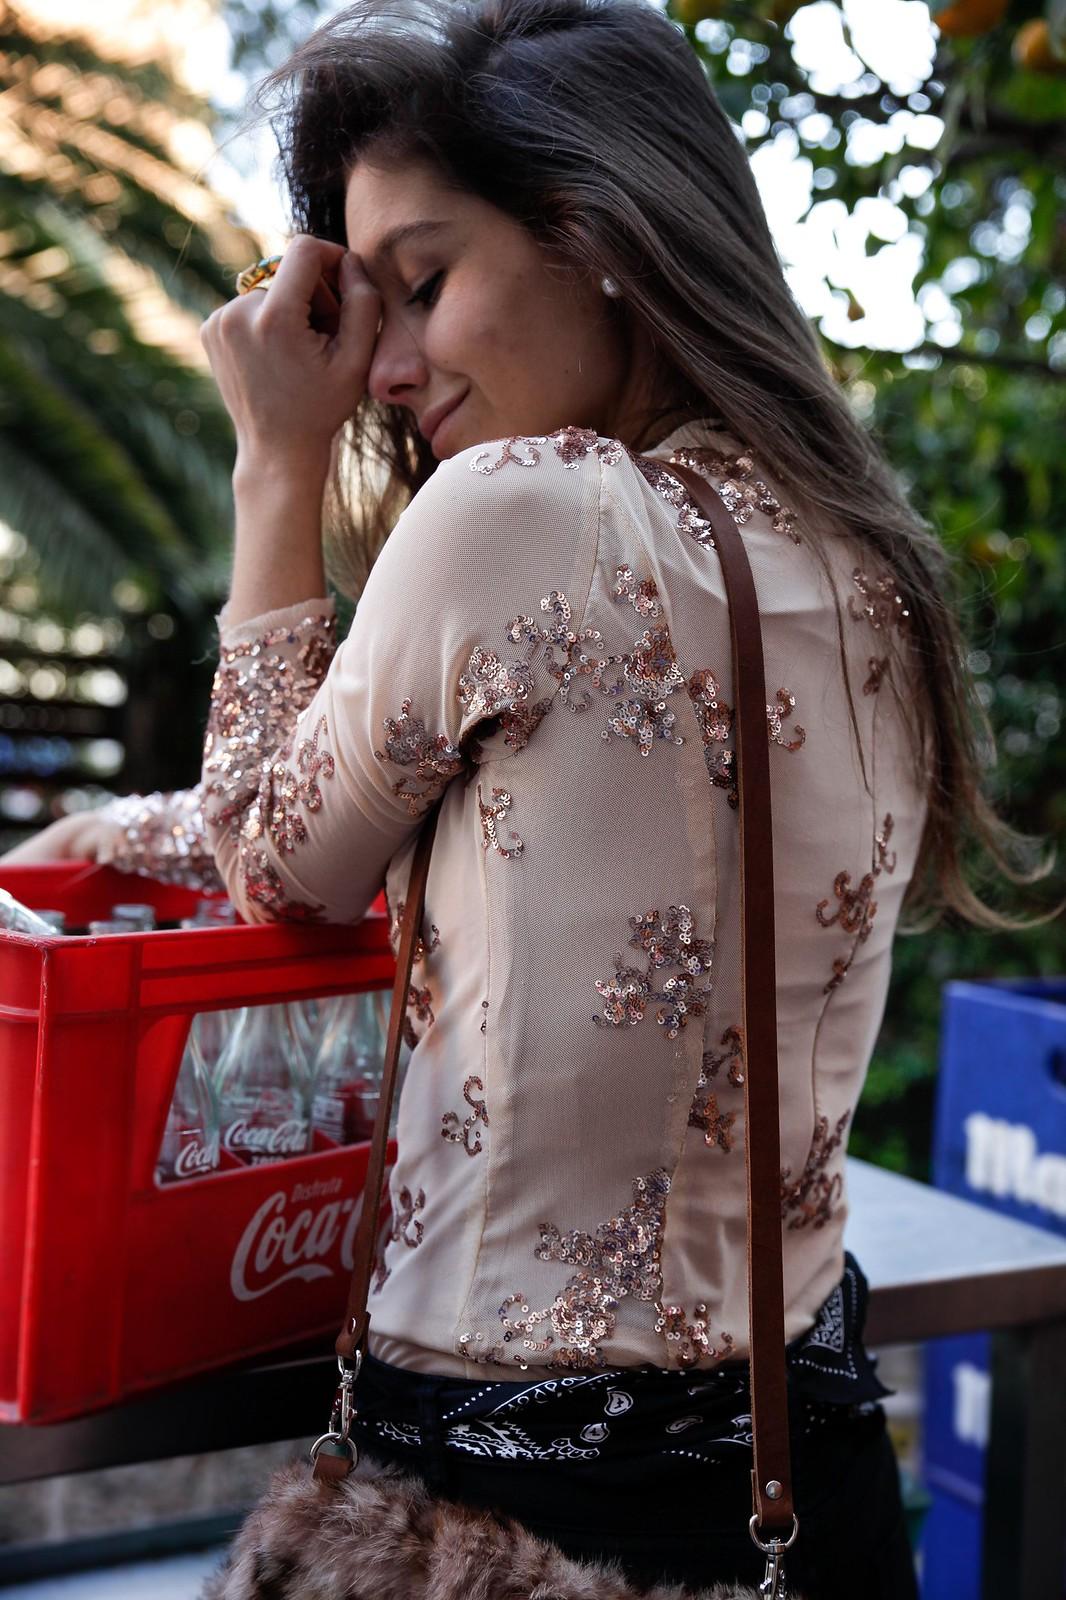 012_Sequins_Body_Nihgt_outfit_Danity_Paris_theguestgirl_laura_santolaria